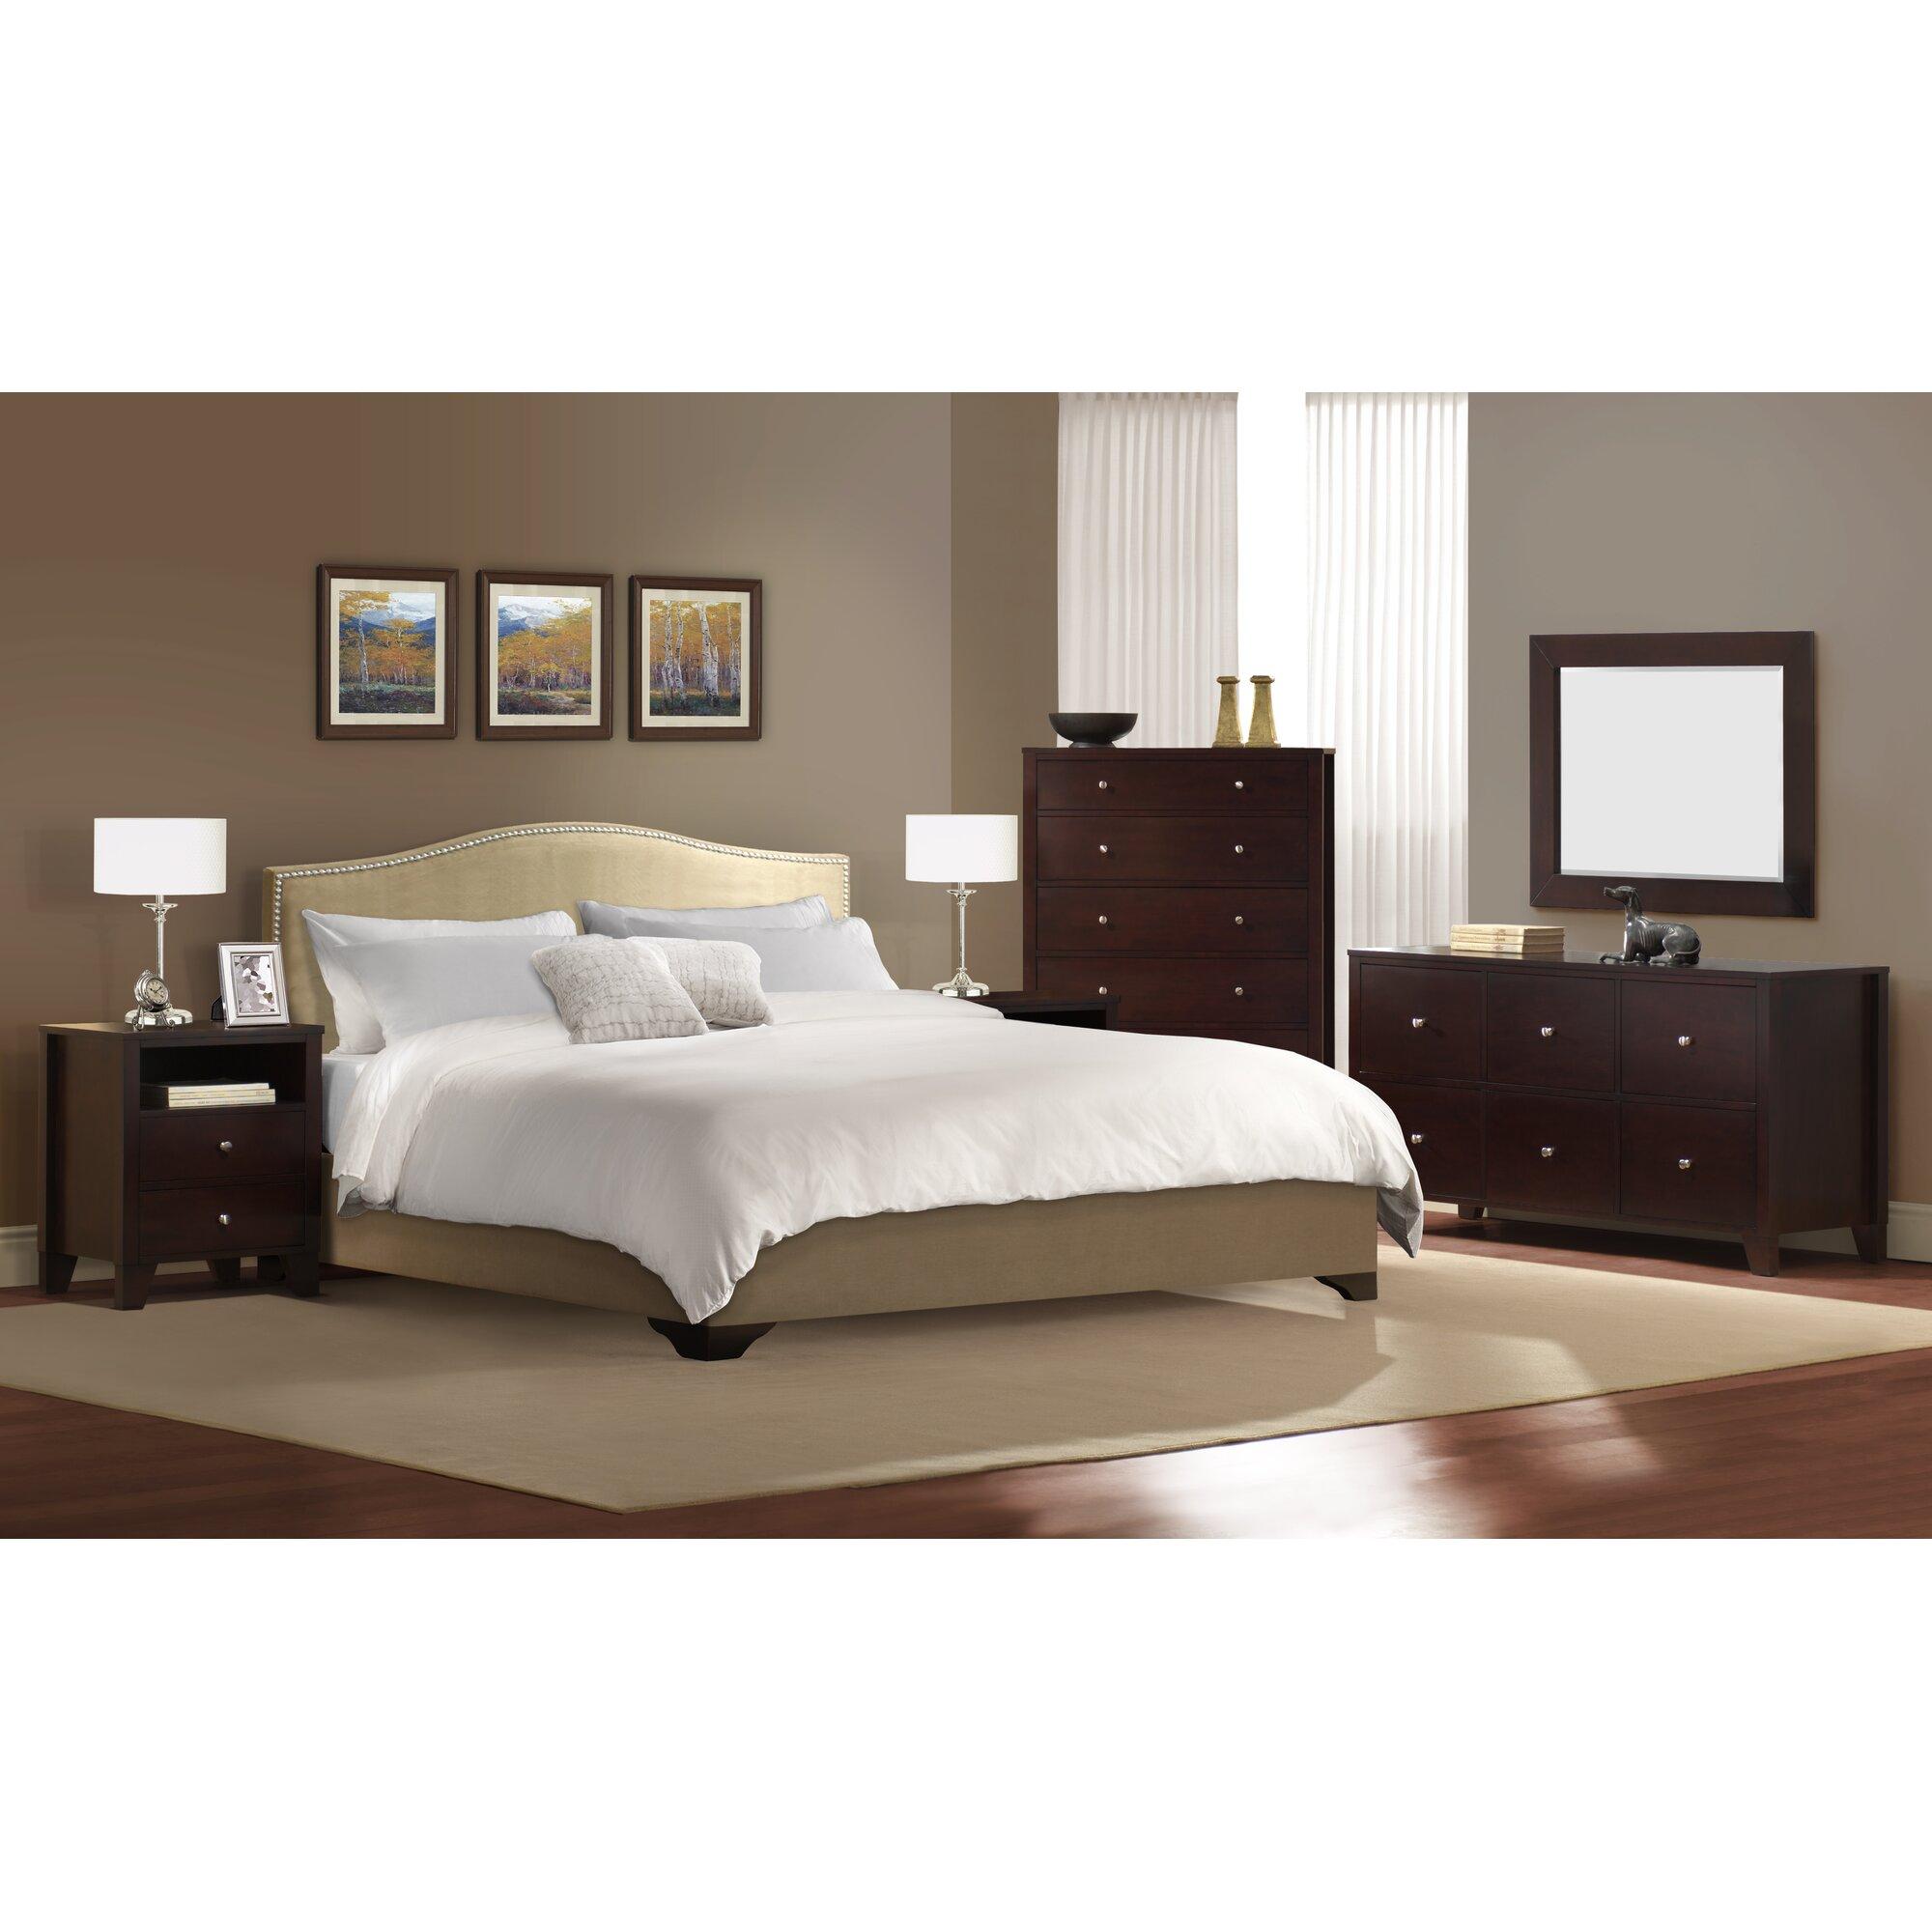 LifeStyle Solutions Magnolia Platform 5 Piece Bedroom Set ...